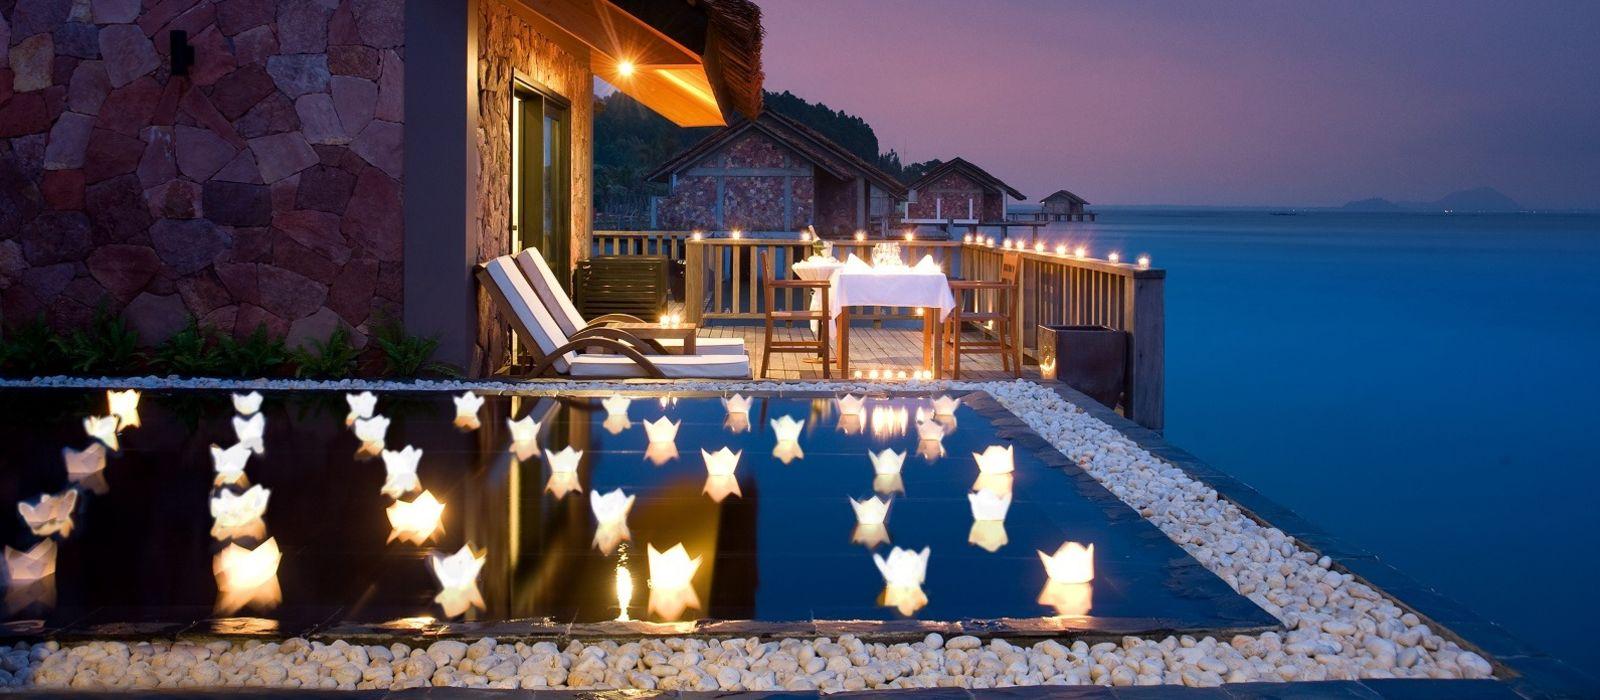 Hotel Vedana Lagoon (Hué) Vietnam